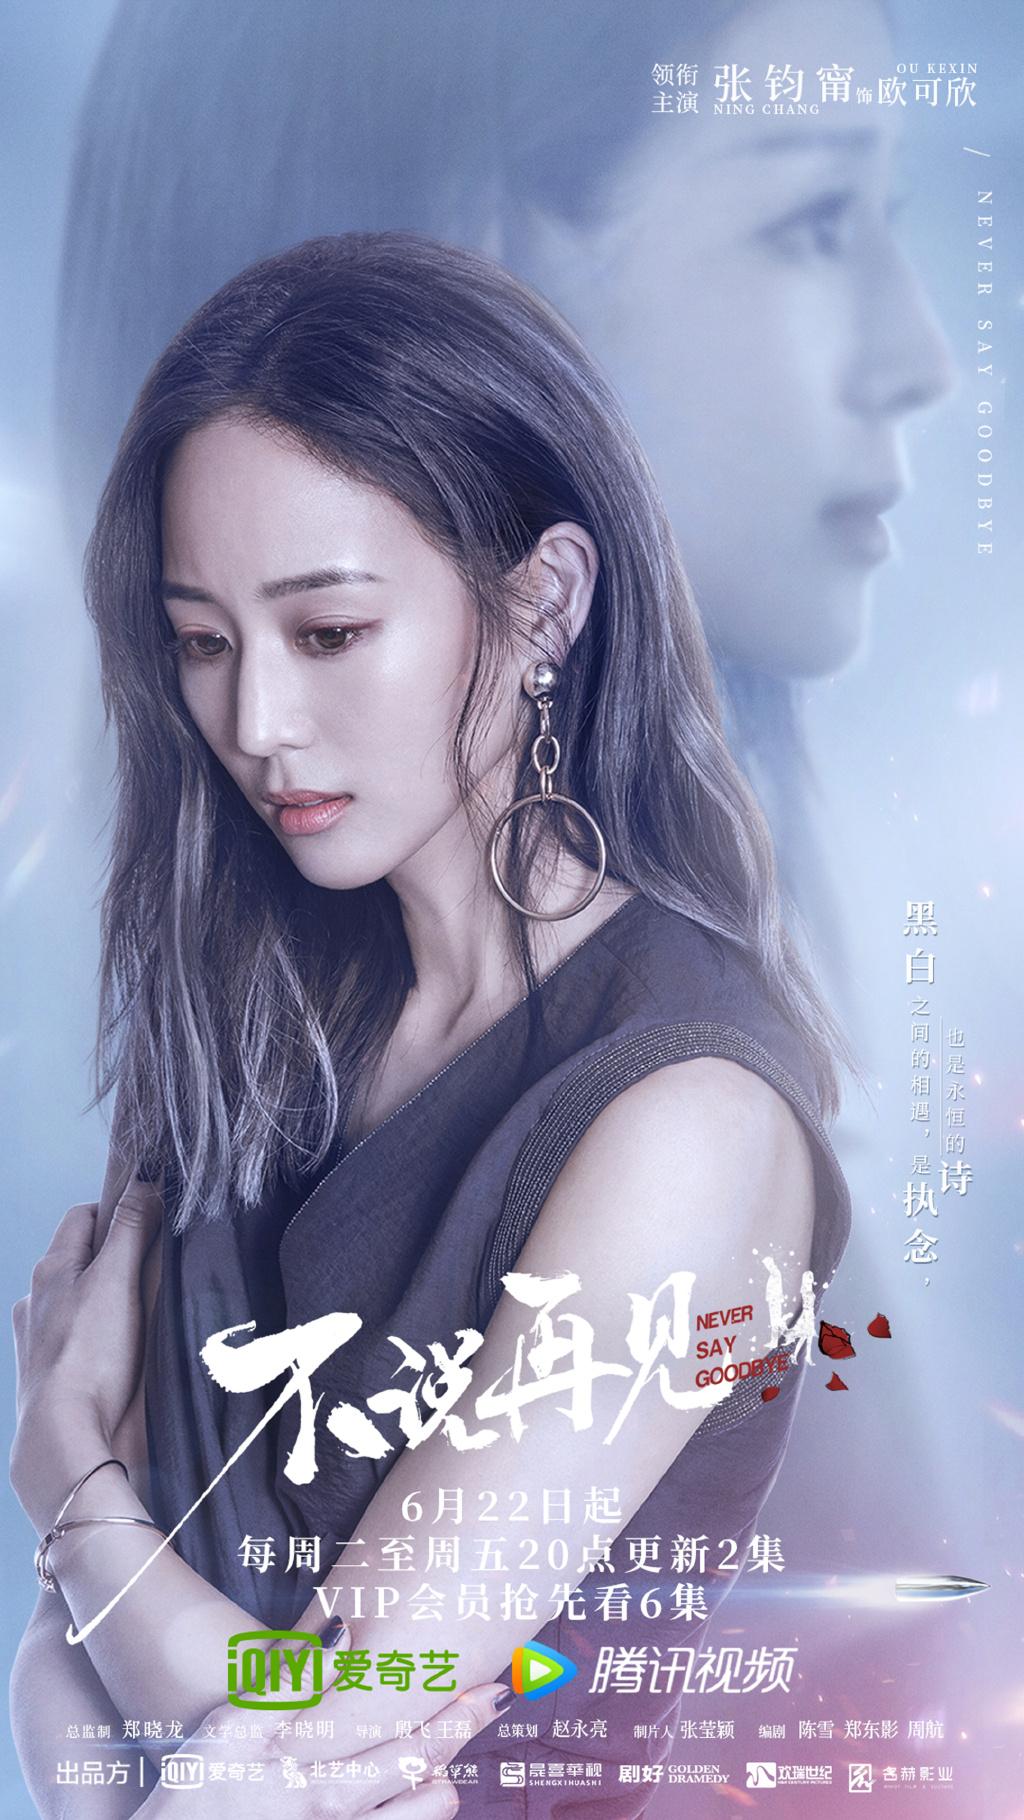 Zhang Jun Ning